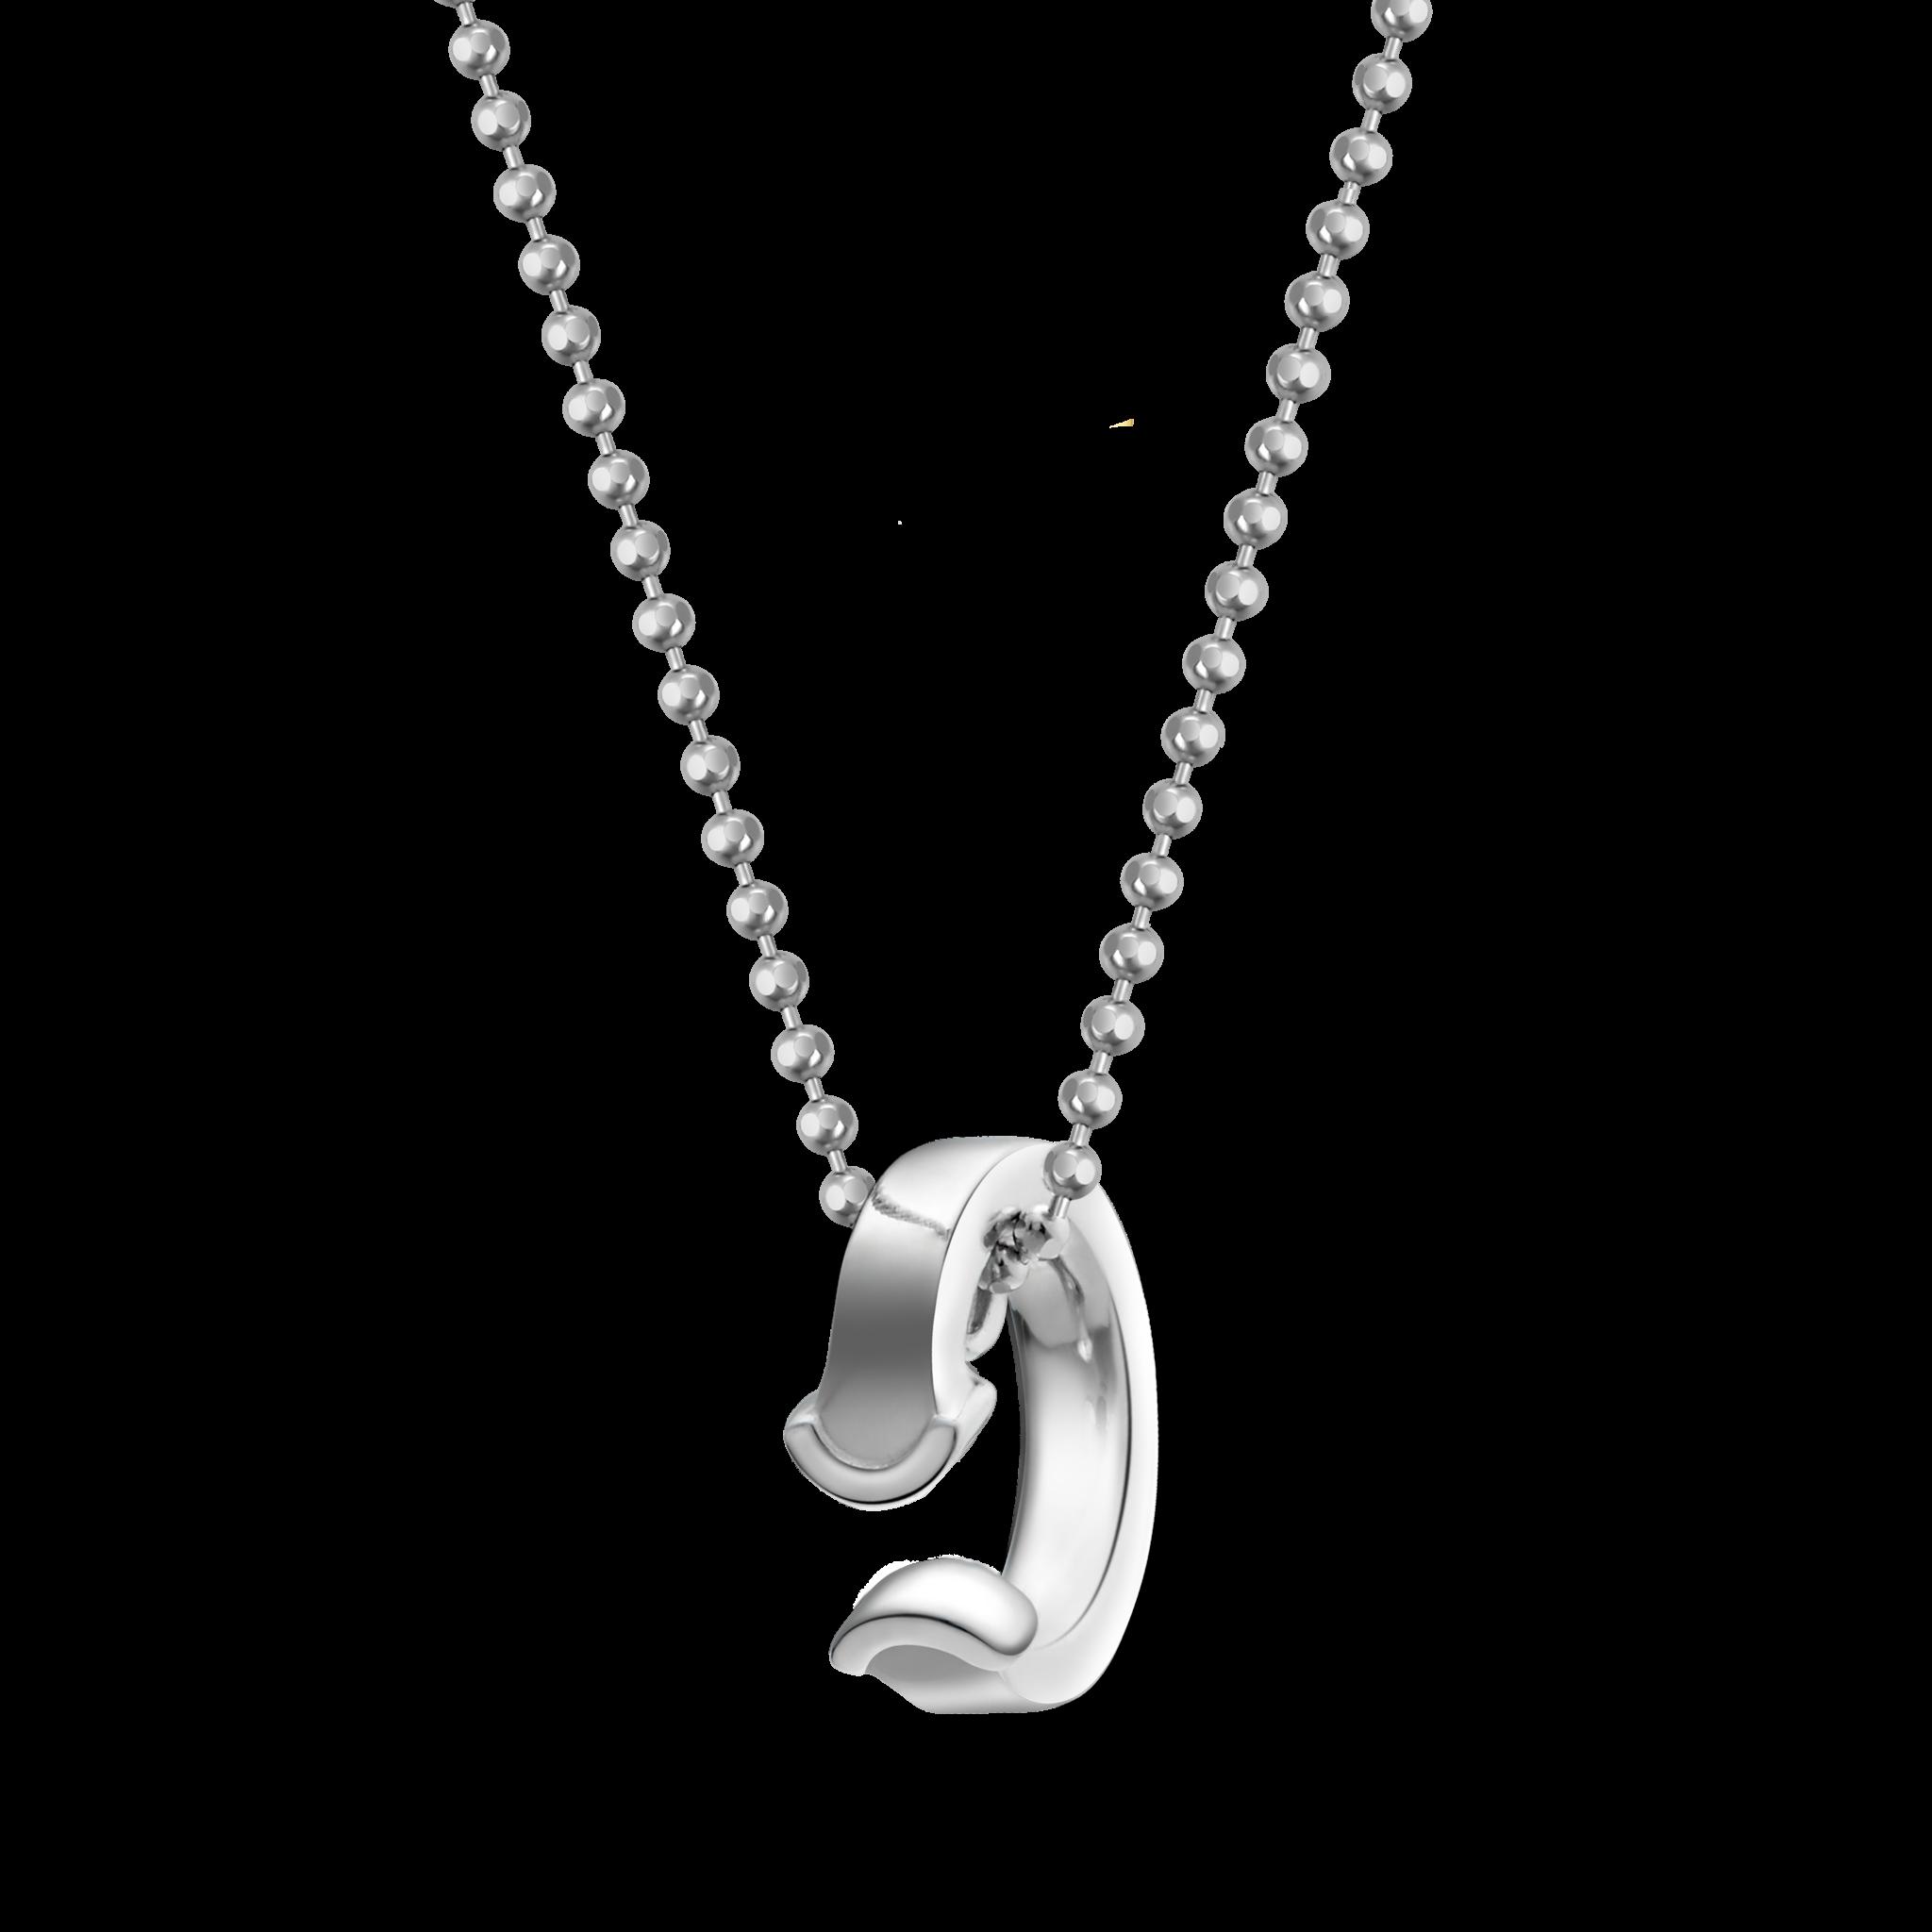 KIZUNA Collection 18K白金项链 5399